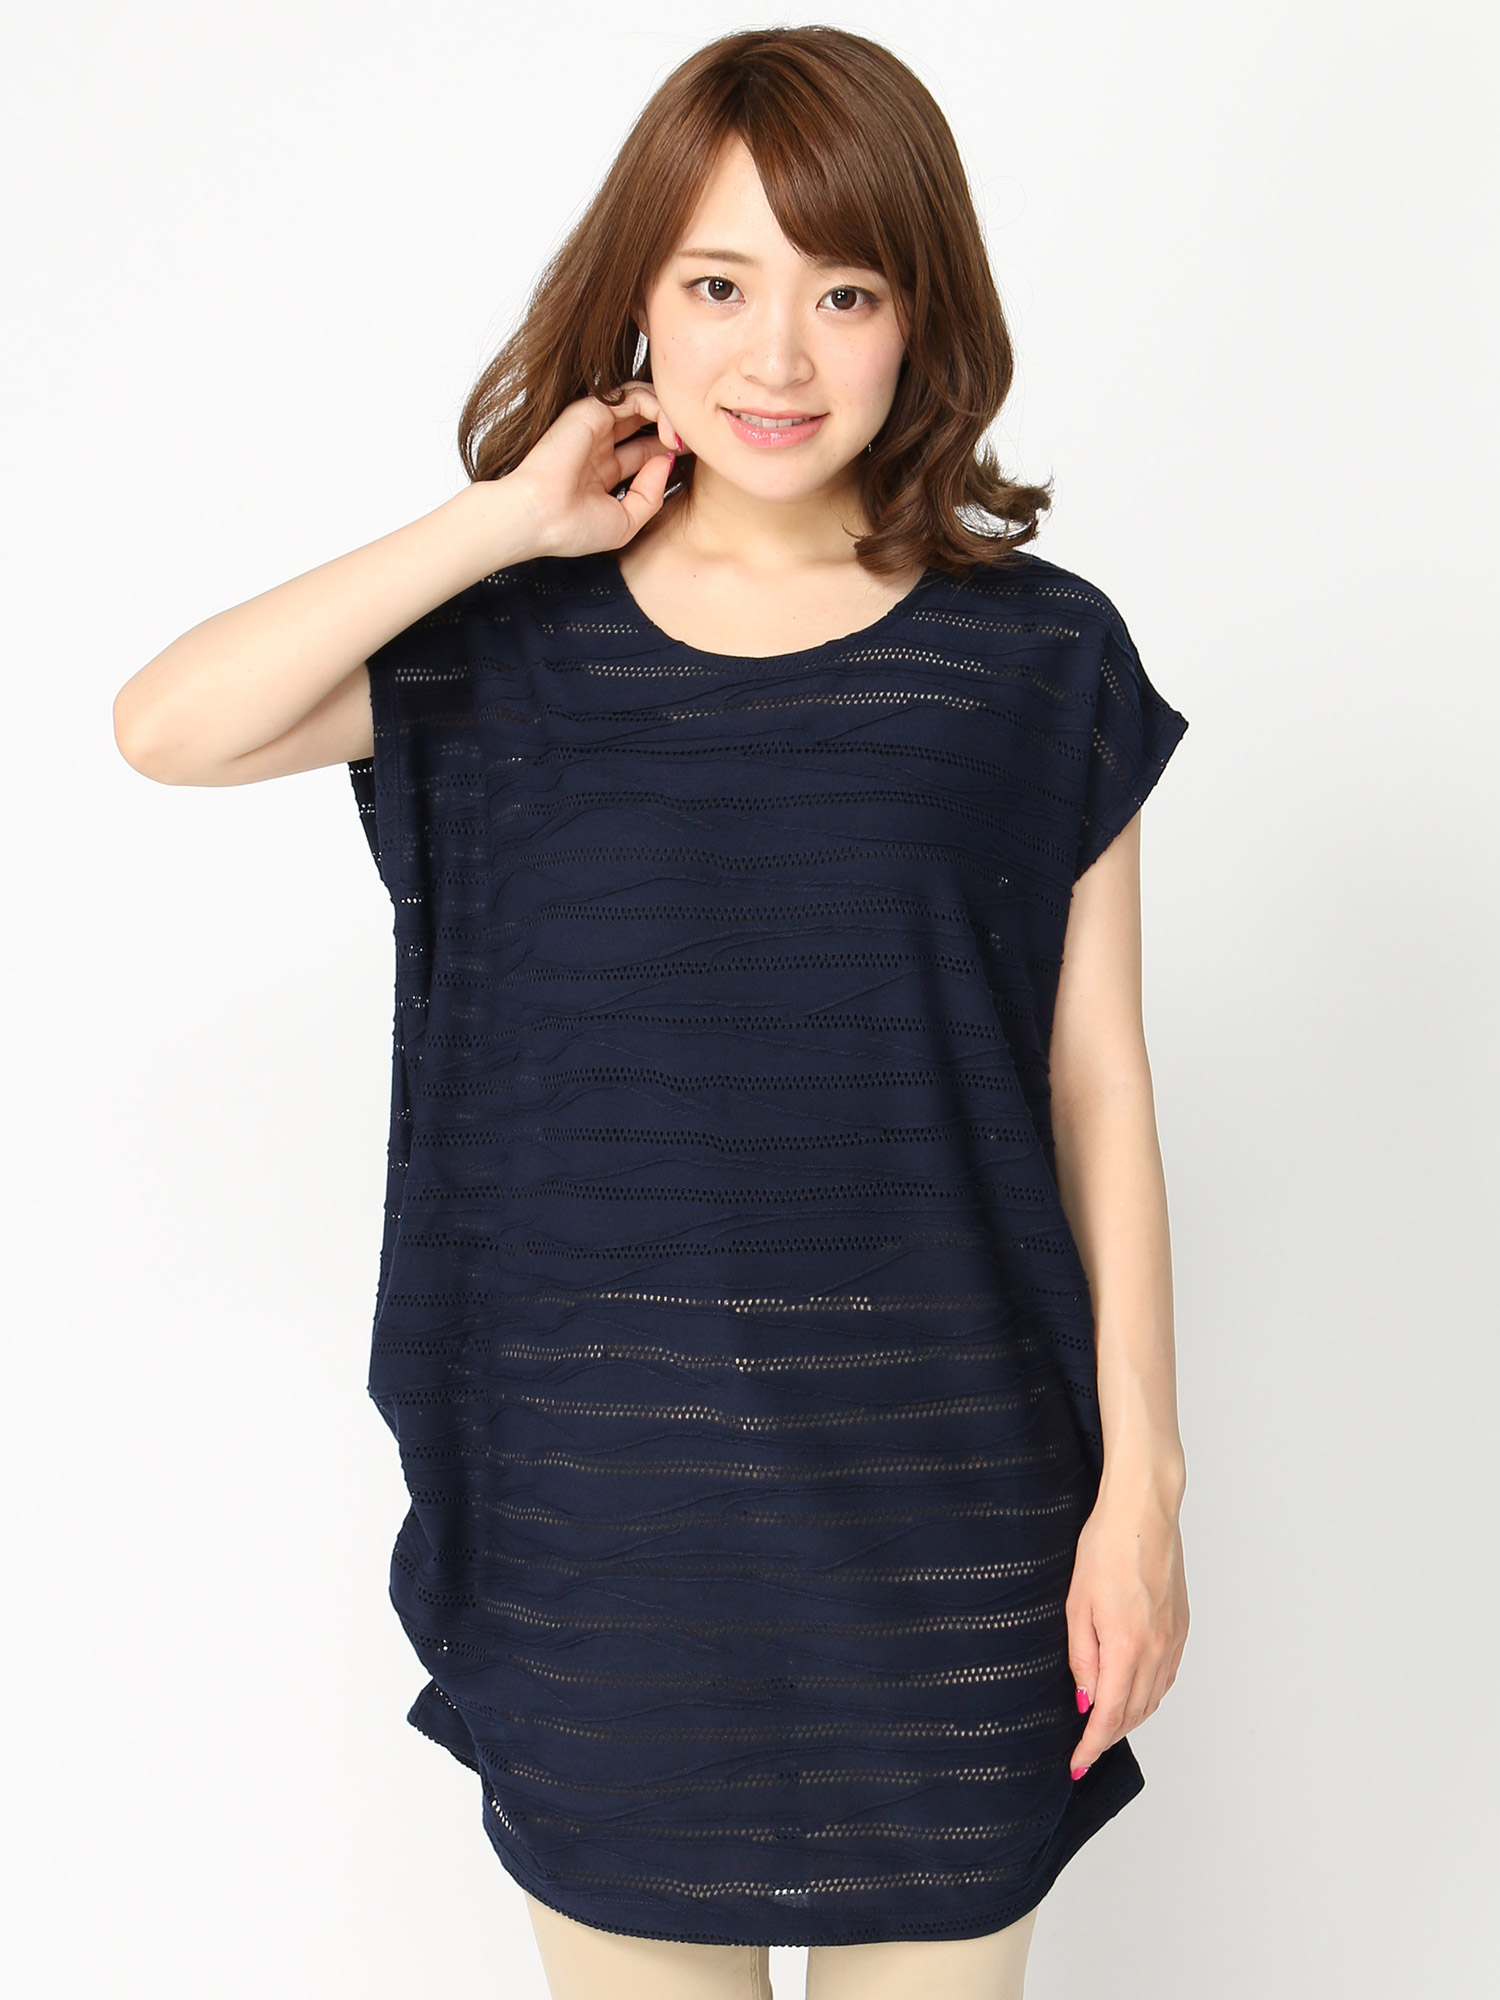 [GIORDANO]ジャガードドルマンゆるTシャツ